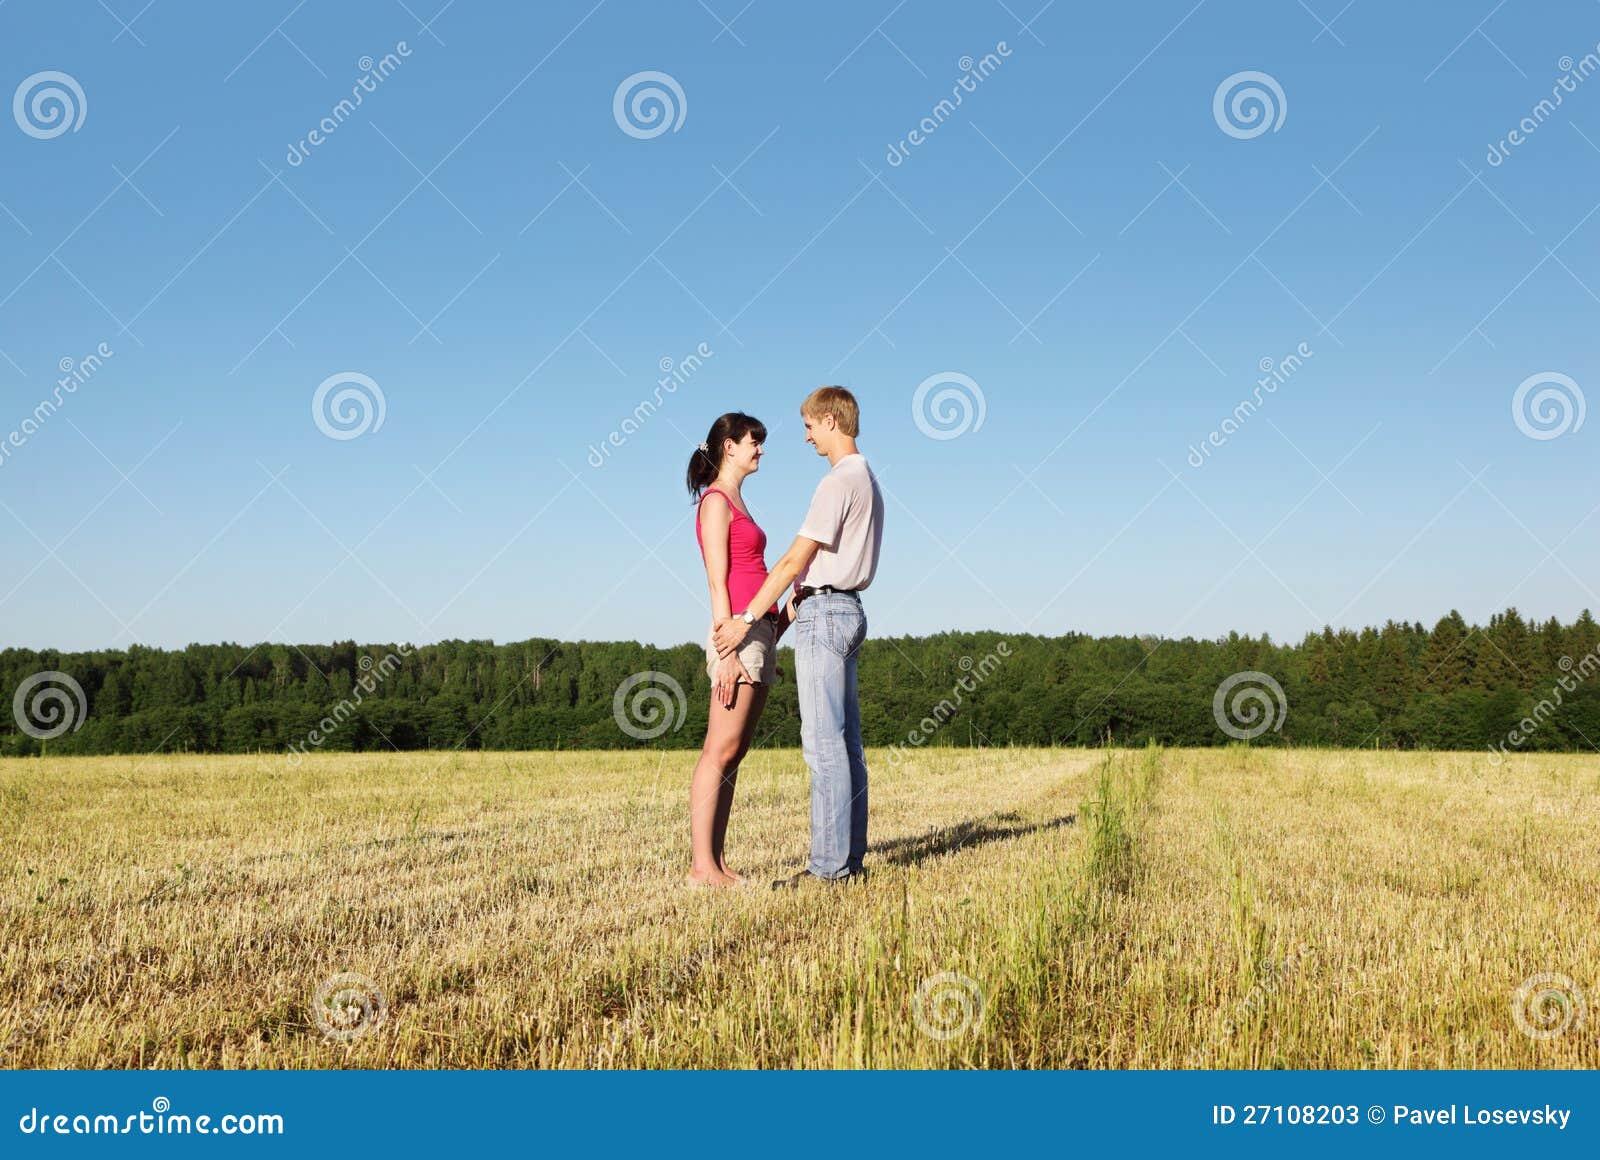 Муж жена и морковка на природе, девушка в очках дала в попу